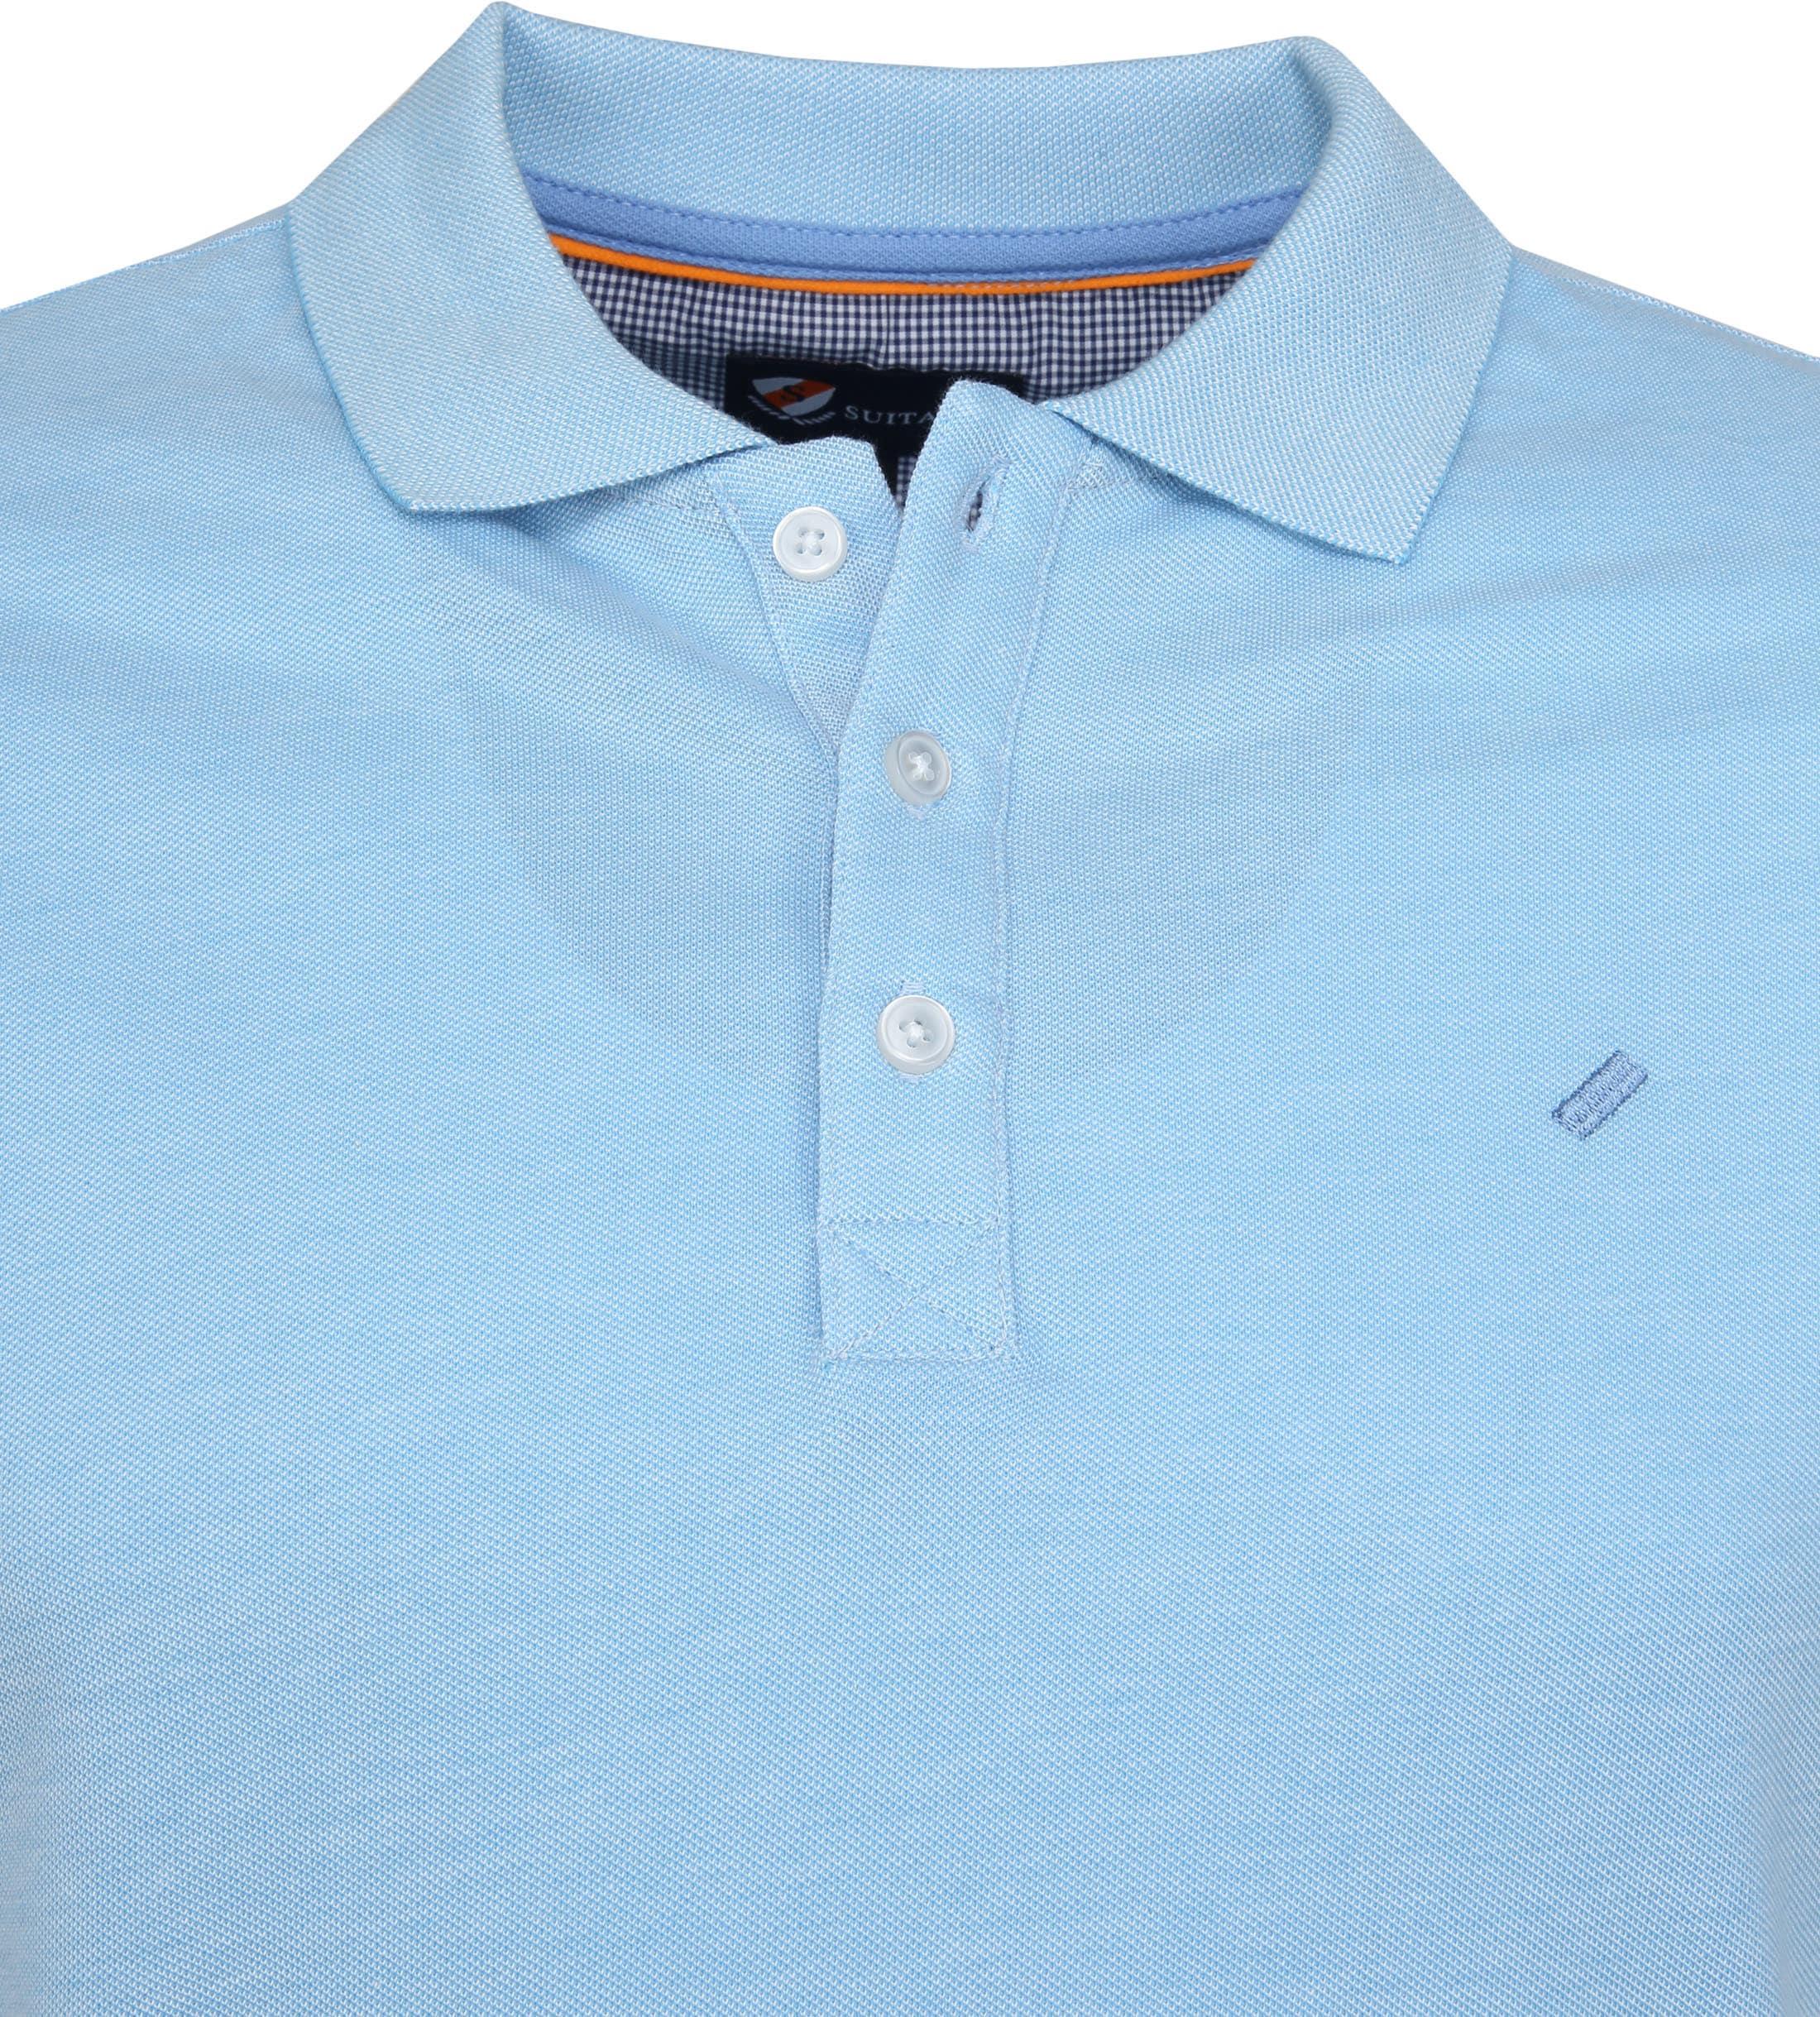 Suitable Oxford Poloshirt Blue photo 1